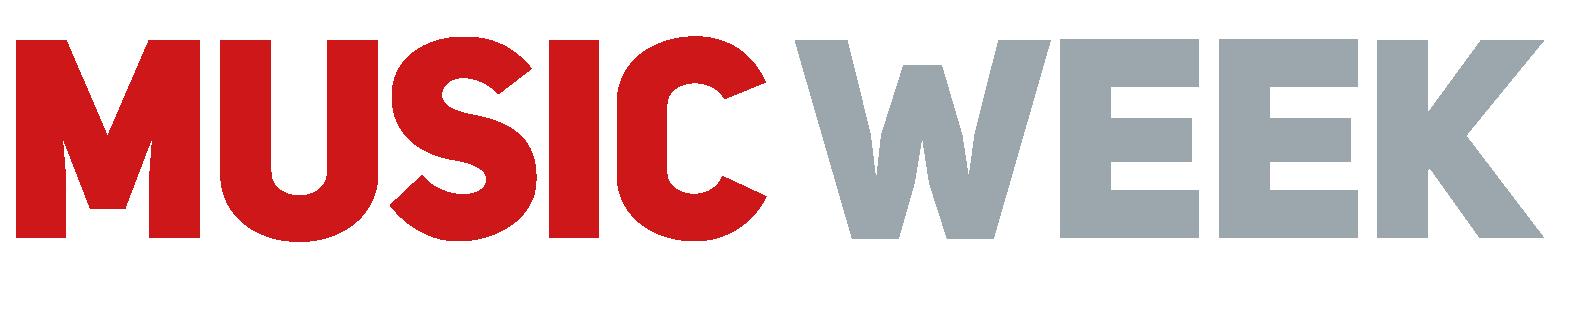 musicweek-logo